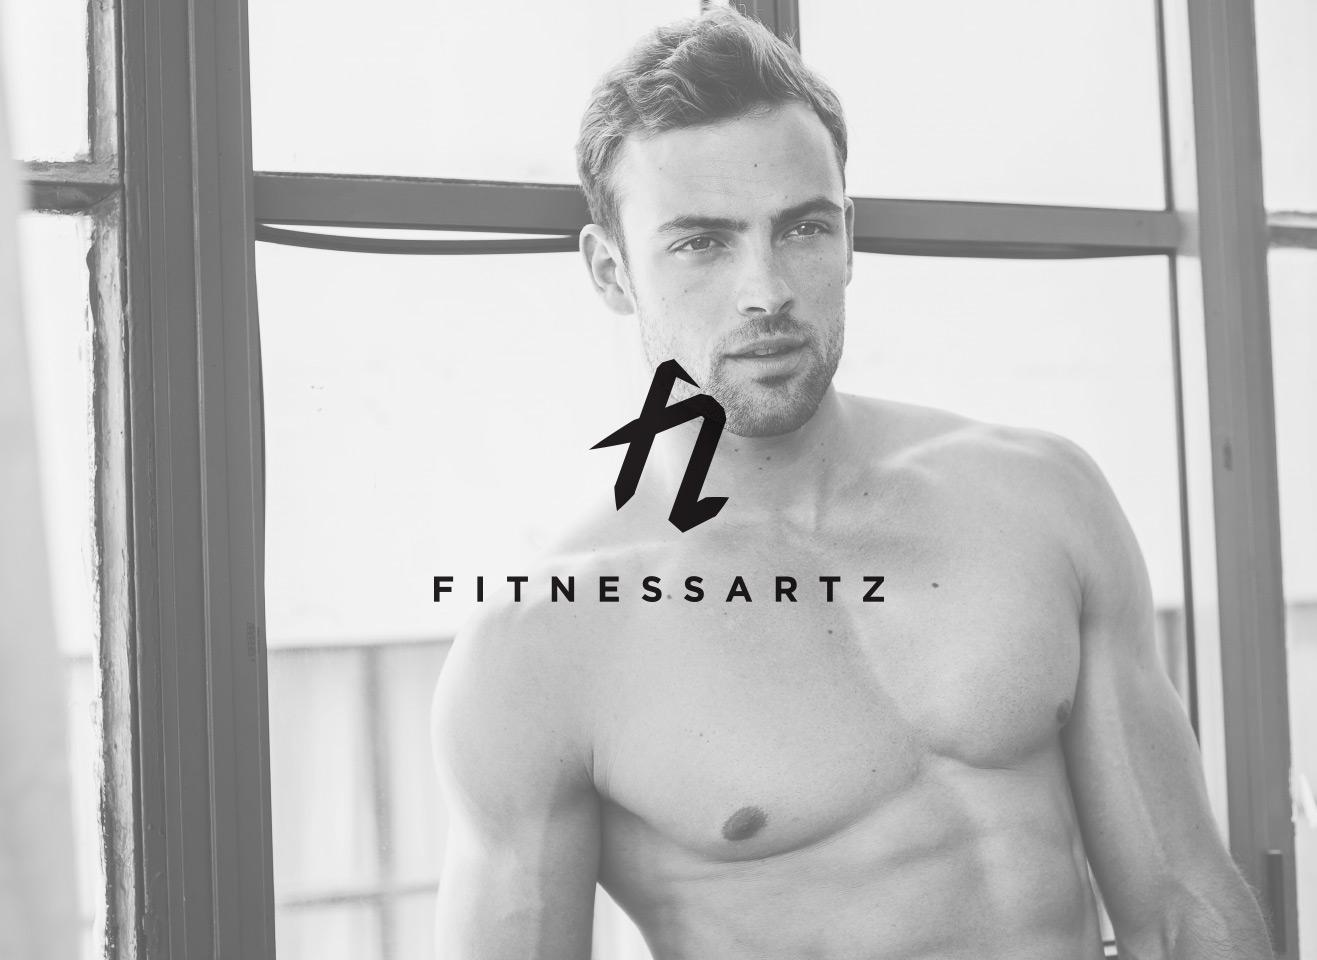 FitnessArtz Branding